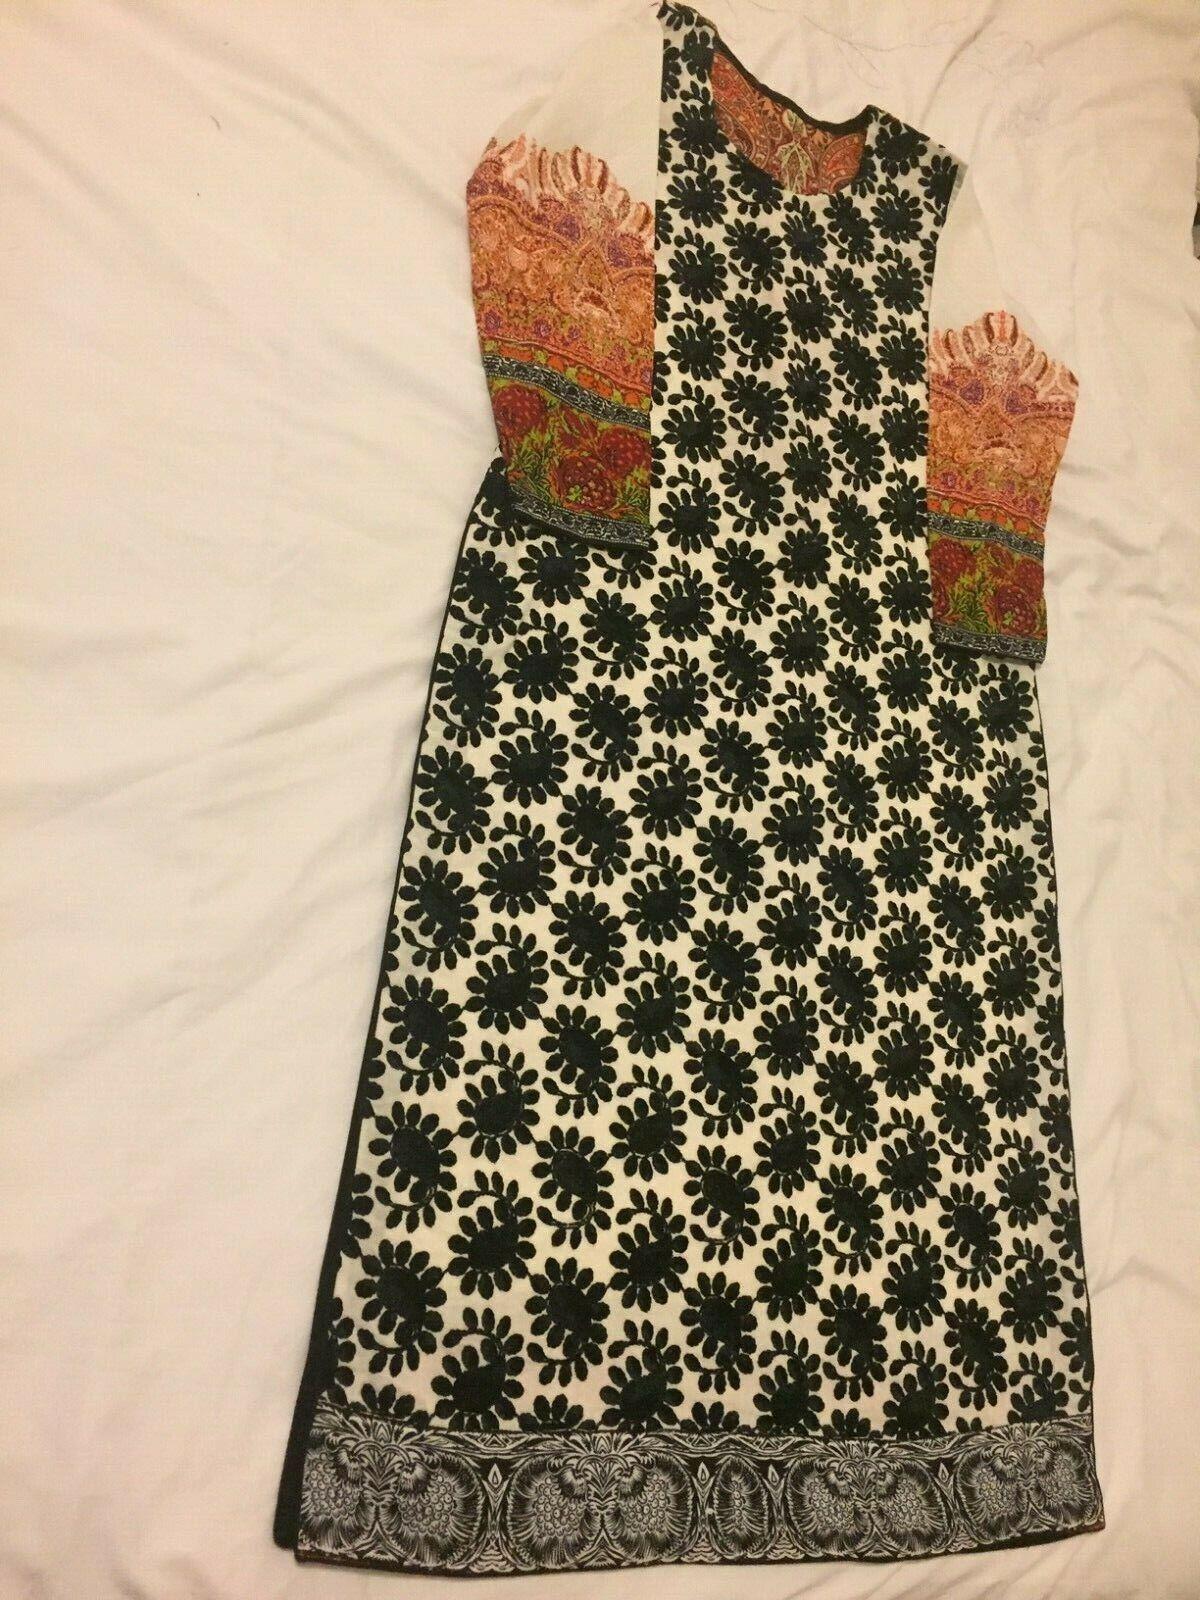 Ladies Asian Original Sana Safinaz Full Suit with Dupatta and Trousers